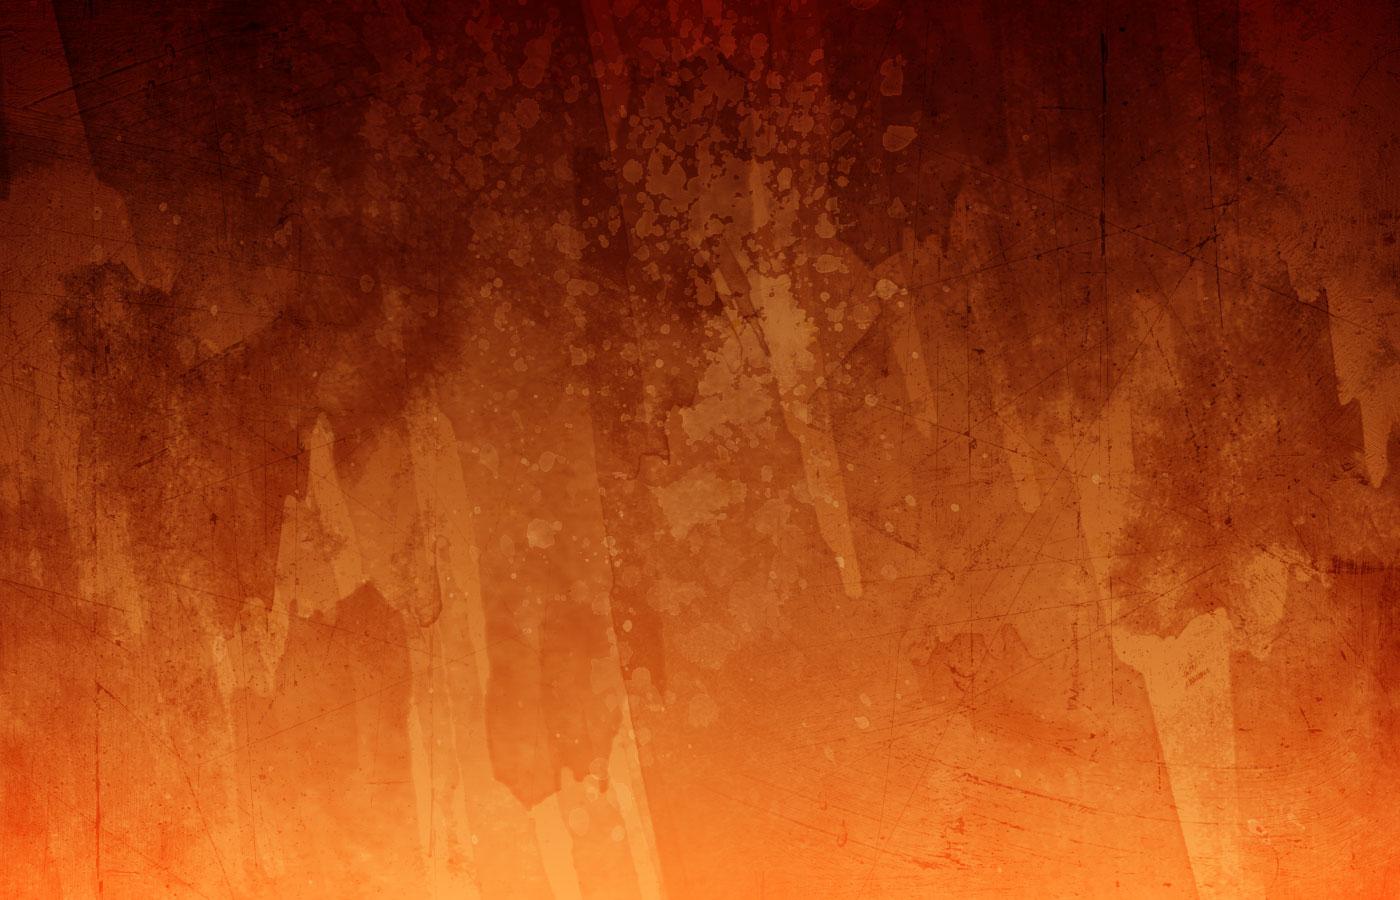 watercolor-grunge-000100-glossy-rust